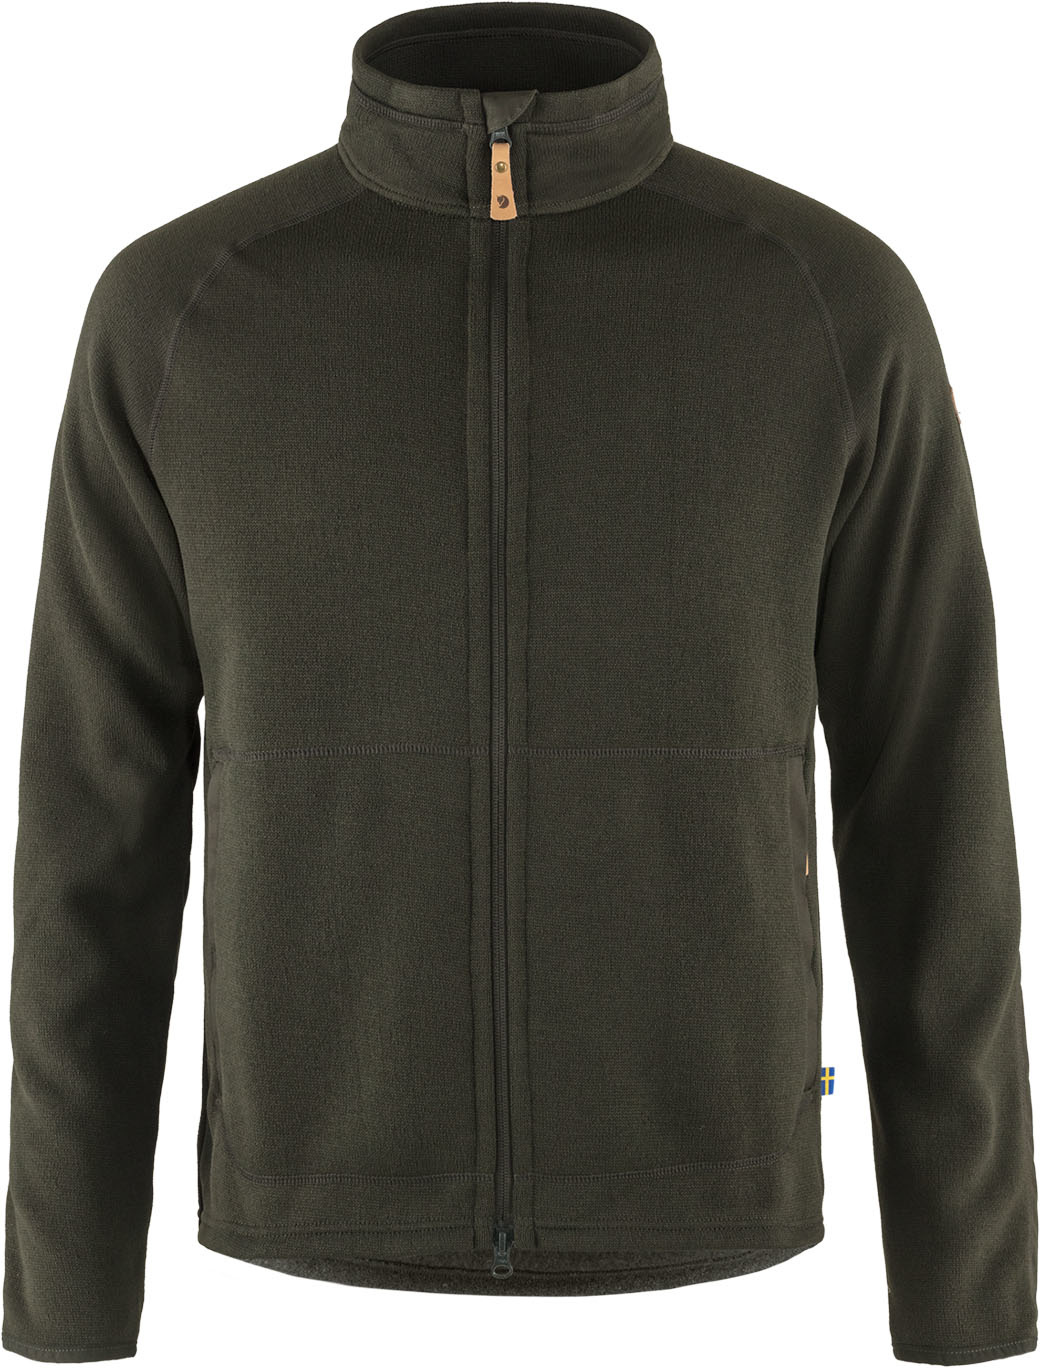 Fjällräven Övik Fleece Zip Sweater M Deep Forest-1